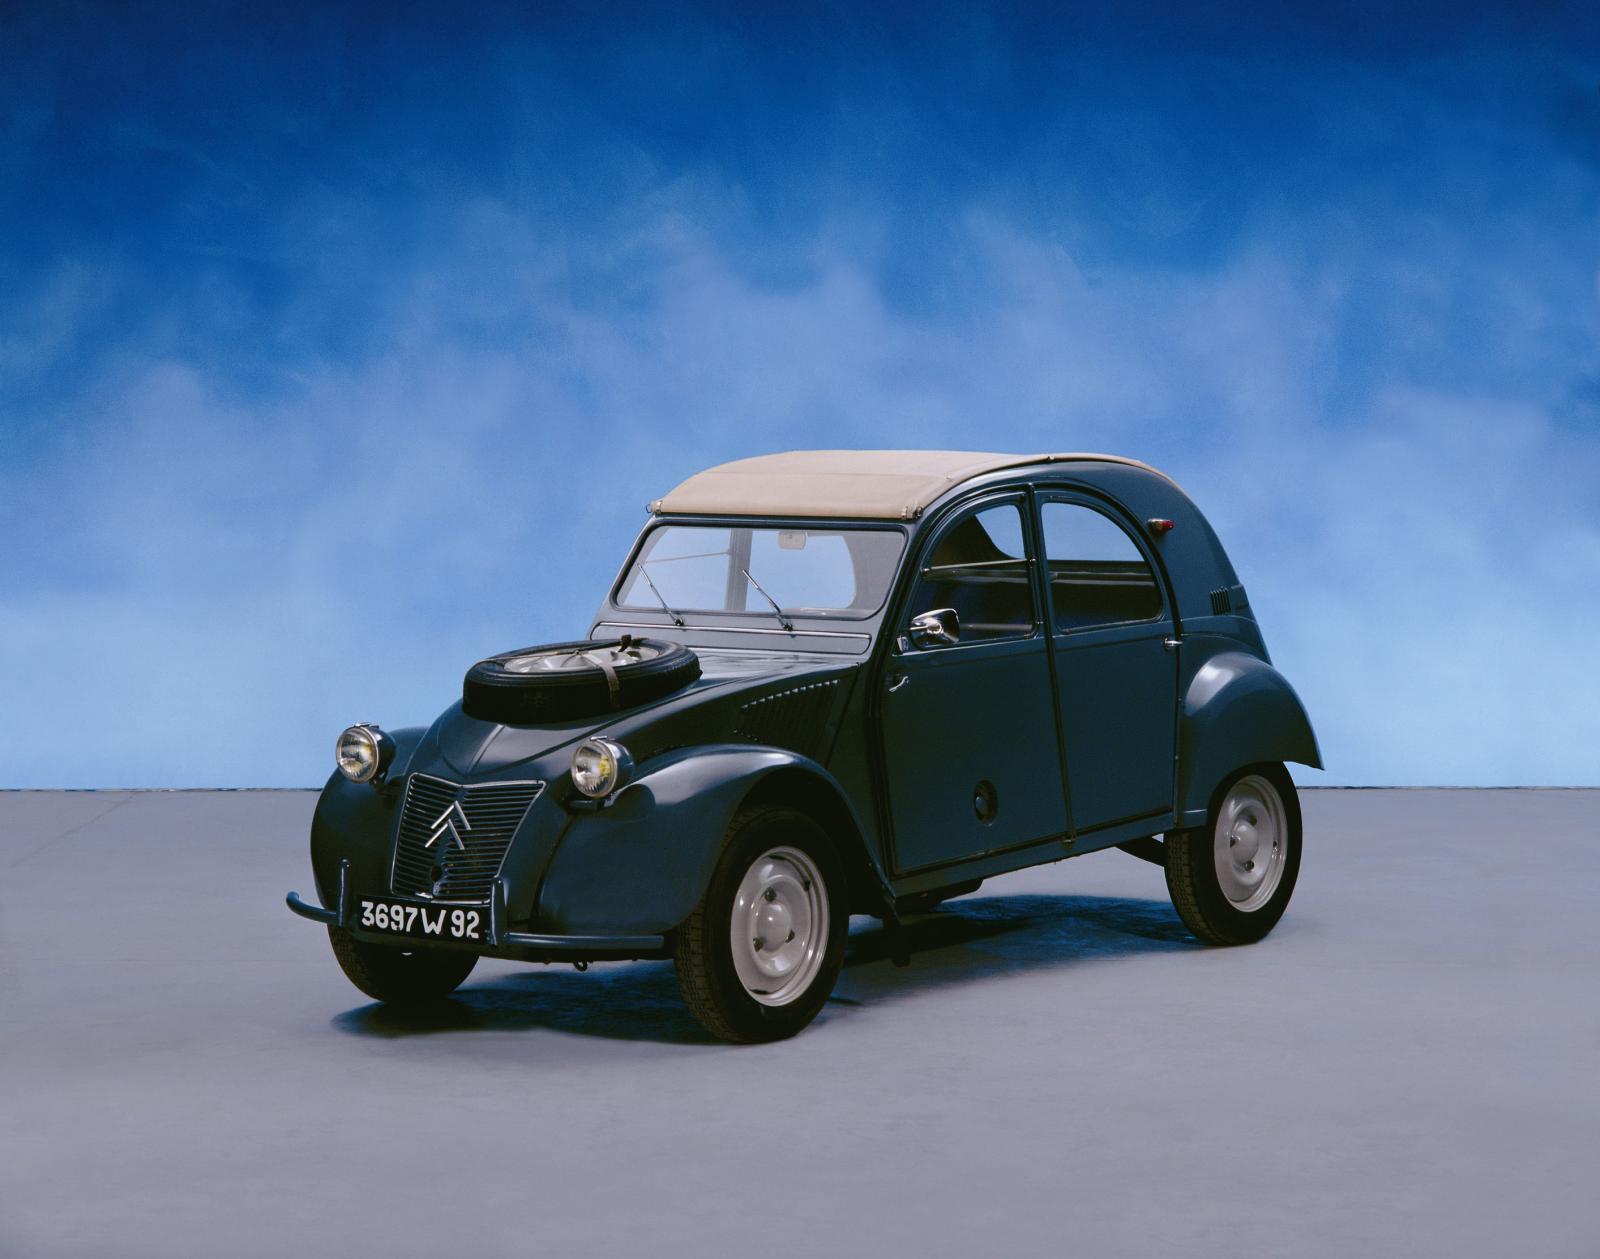 2CV 4x4 Sahara 3/4 Frontansicht 1960